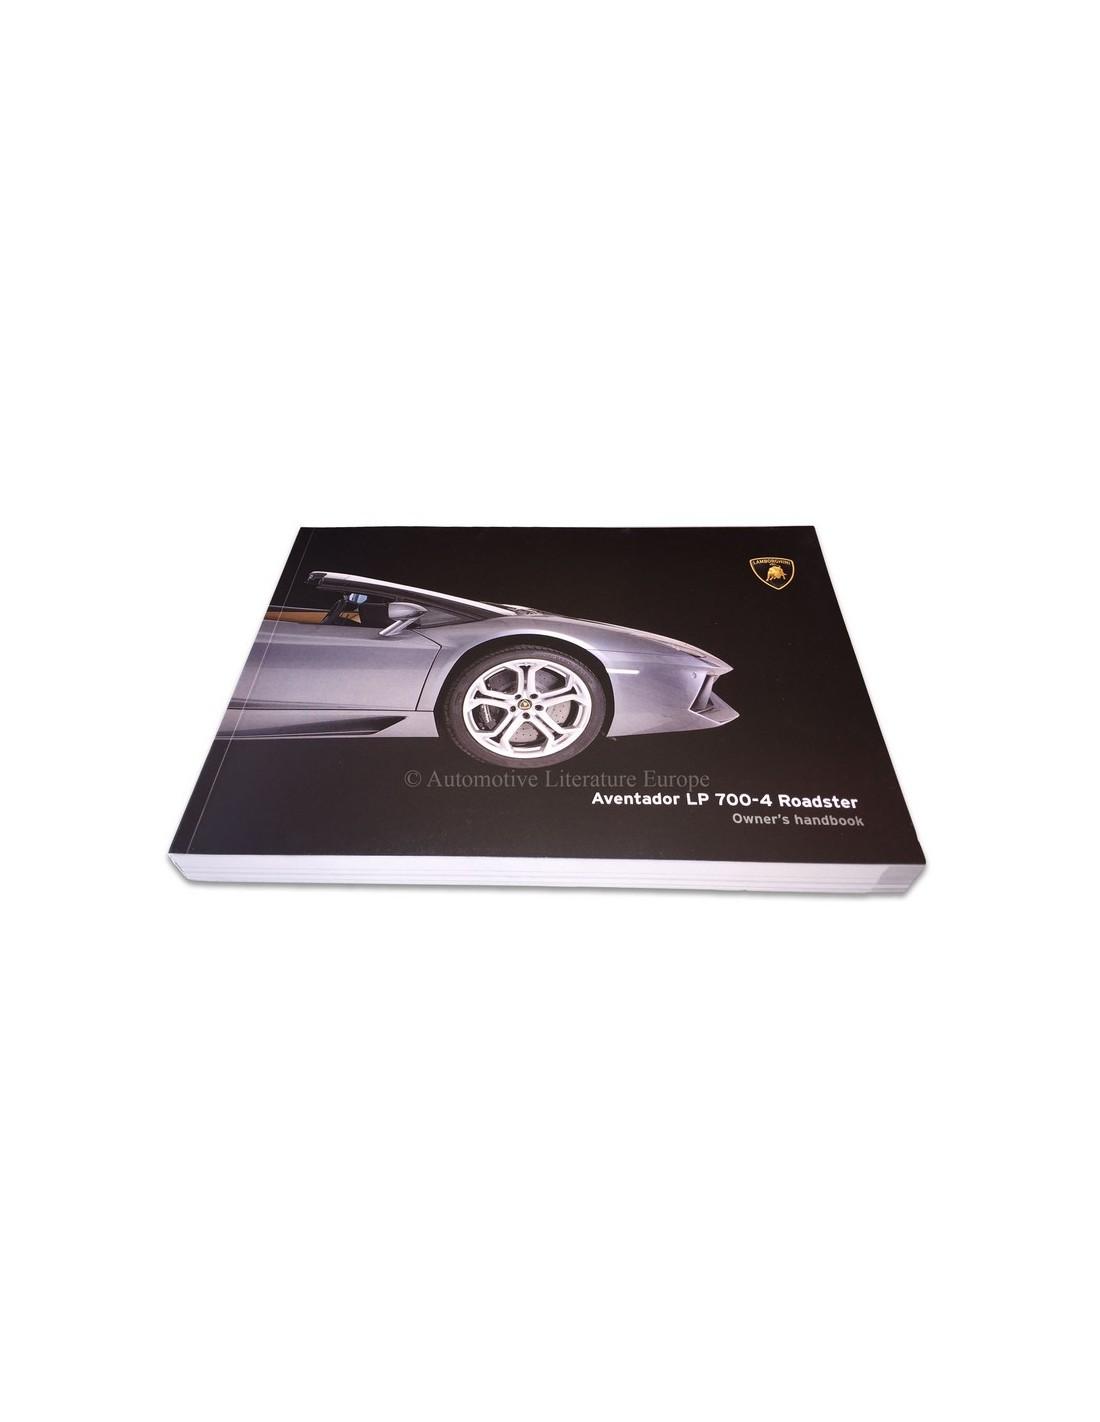 2014 Lamborghini Aventador Lp700 4: 2014 LAMBORGHINI AVENTADOR LP 700-4 ROADSTER